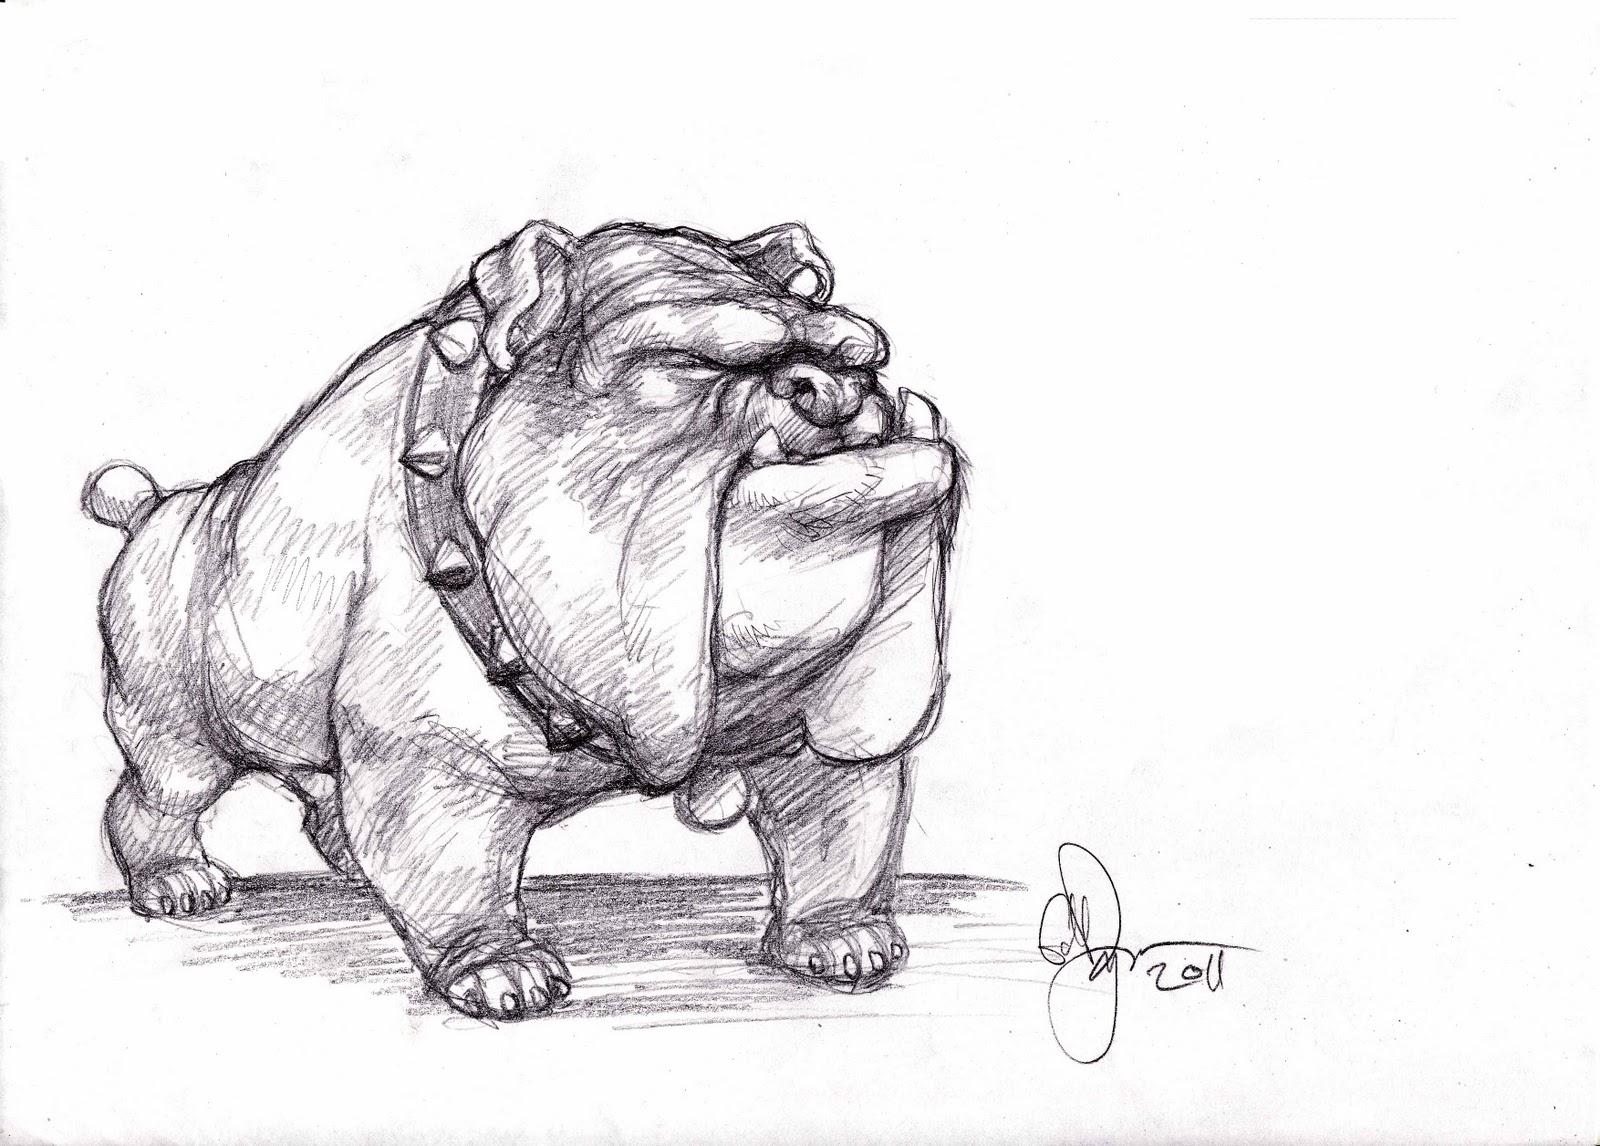 The Art of Ed Dyer.: Bulldog Sketch